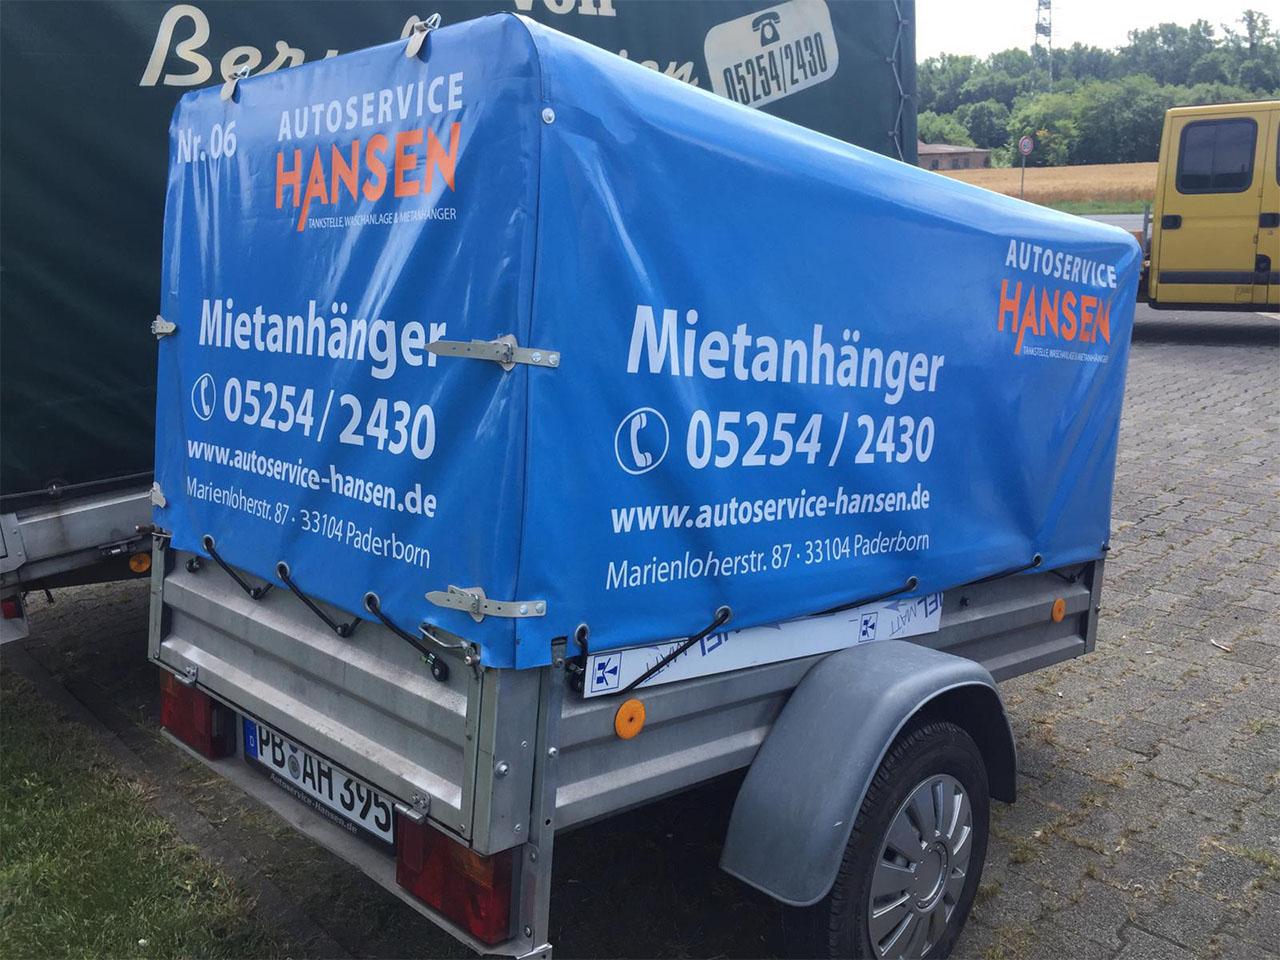 autoservice-hansen-anhaenger-paderborn-PB-AH395-2